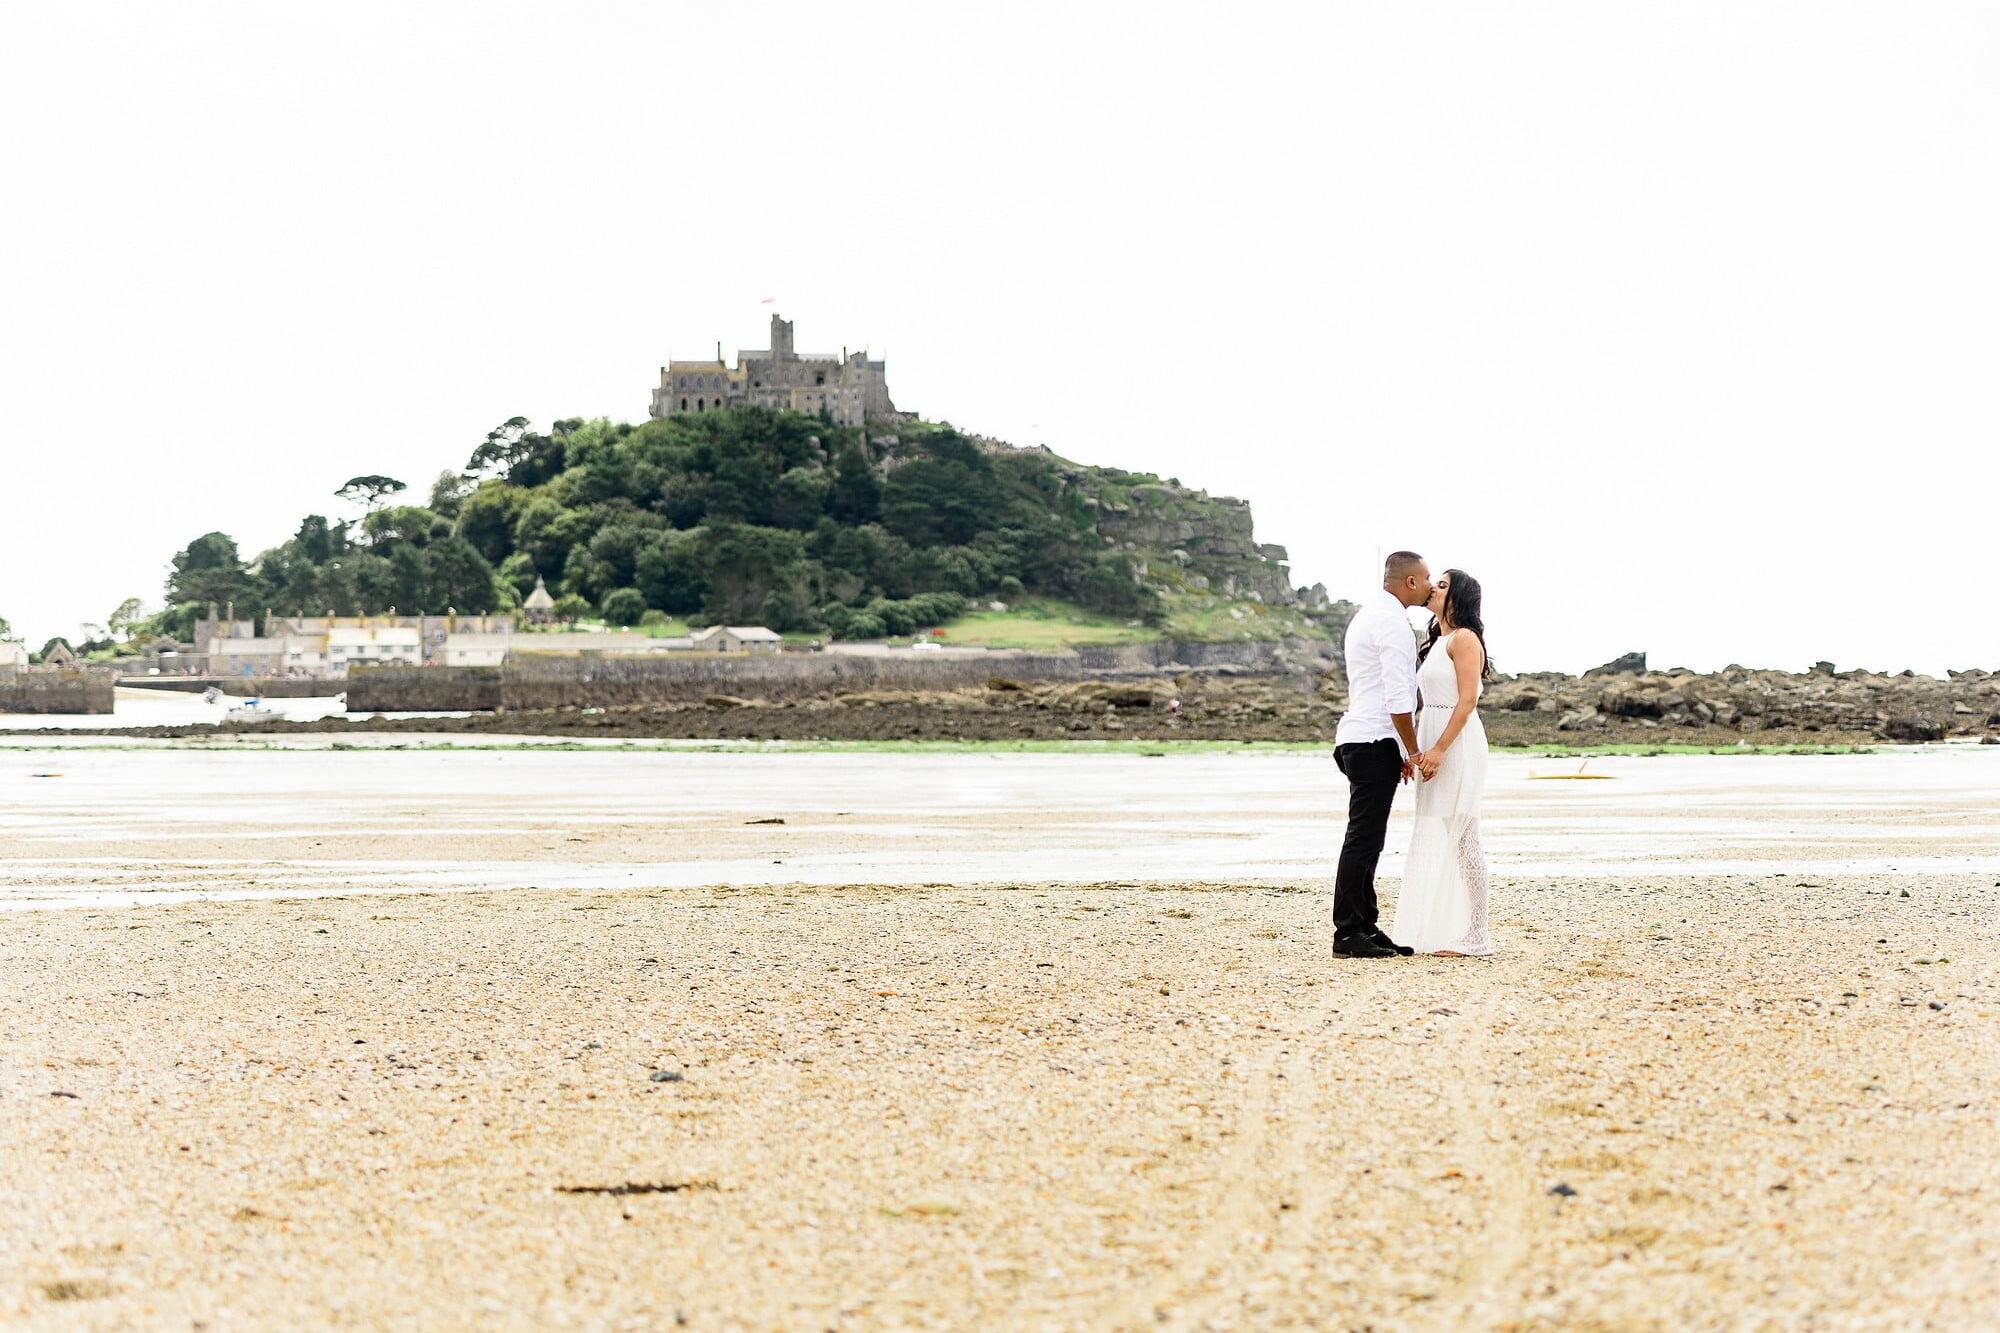 st-michaels-mount-wedding-proposal-10